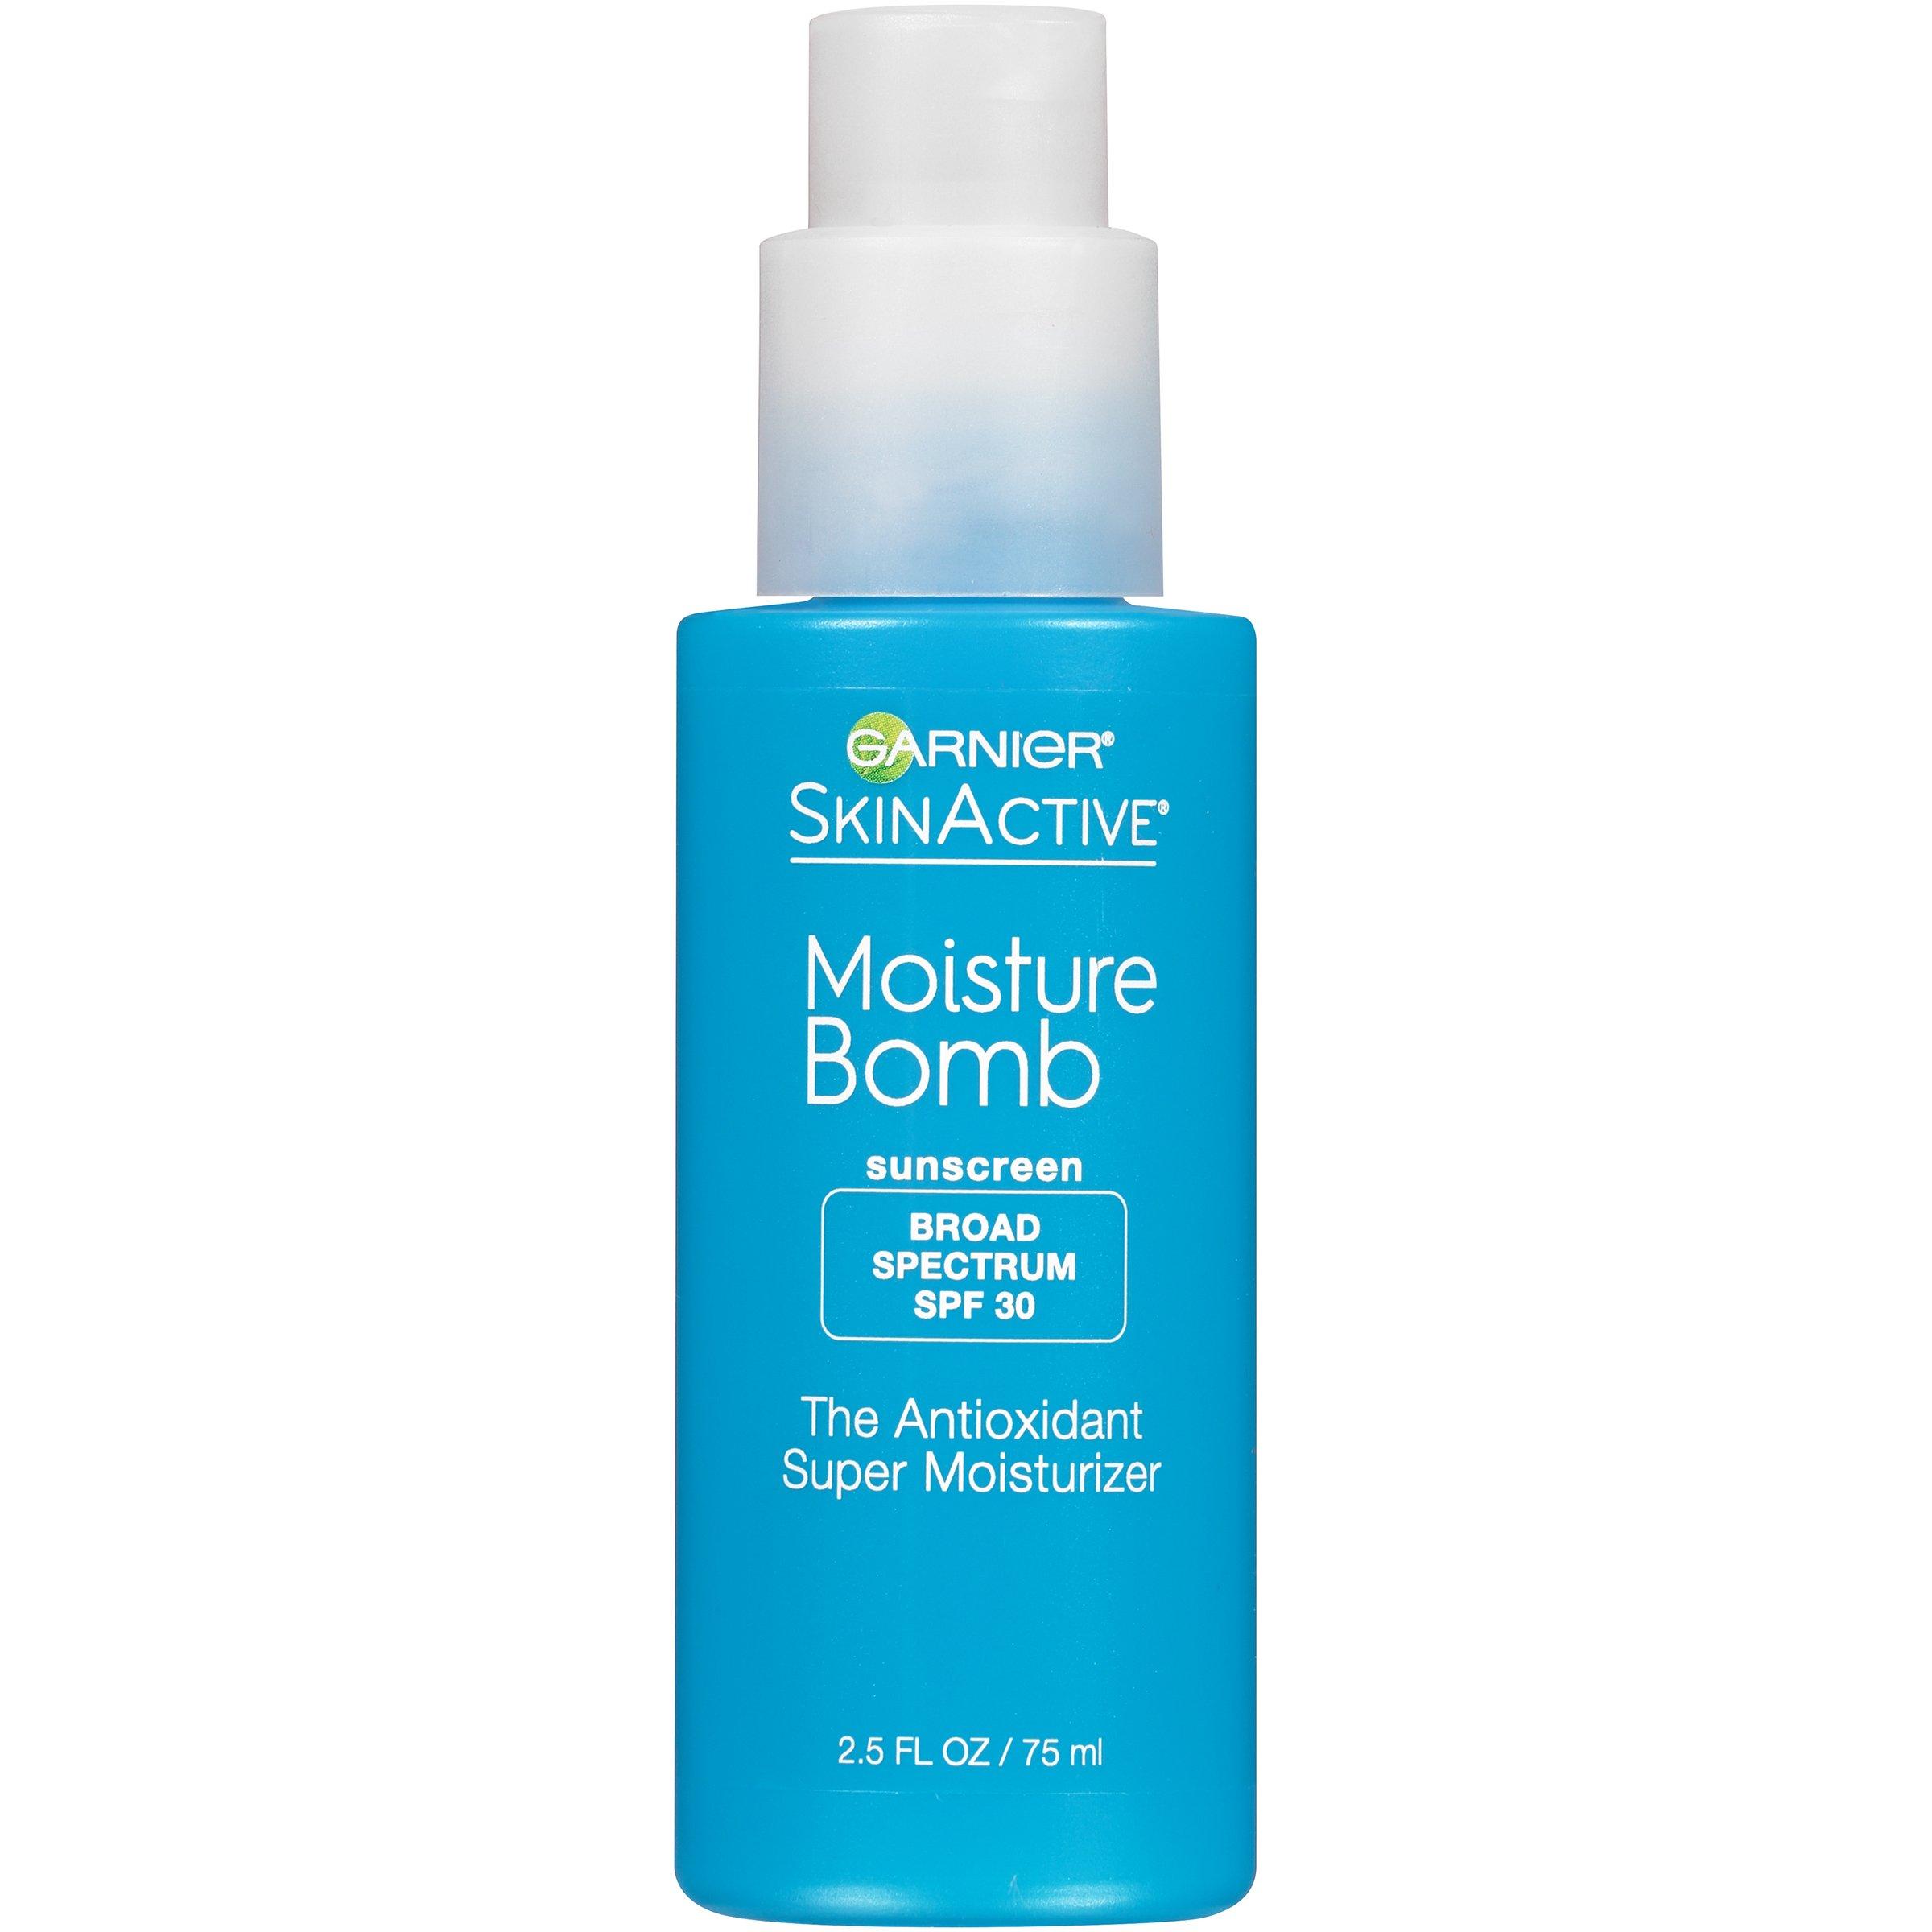 Garnier SkinActive SPF 30 Moisturizer with Hyaluronic Acid,  2.5 fl. oz.